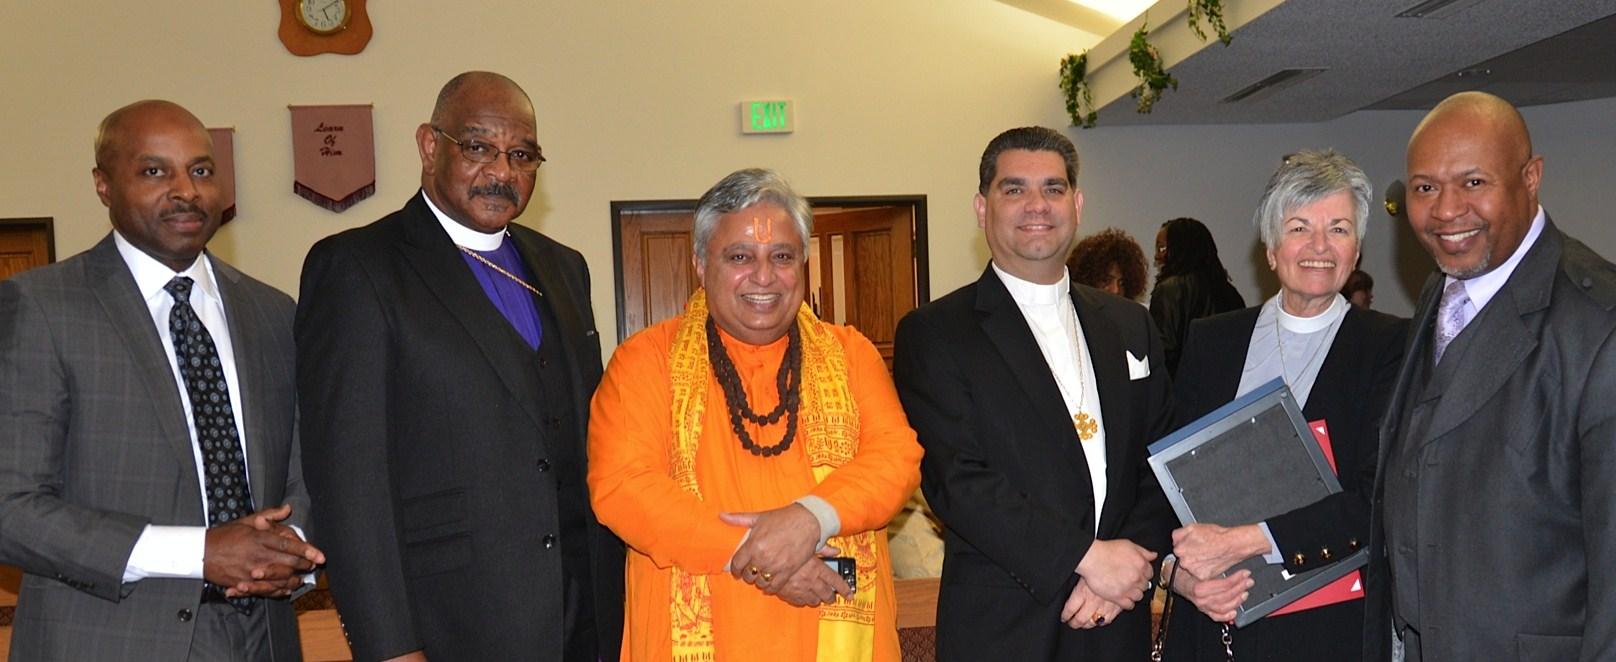 Martin Luther King  Interfaith Service 2014